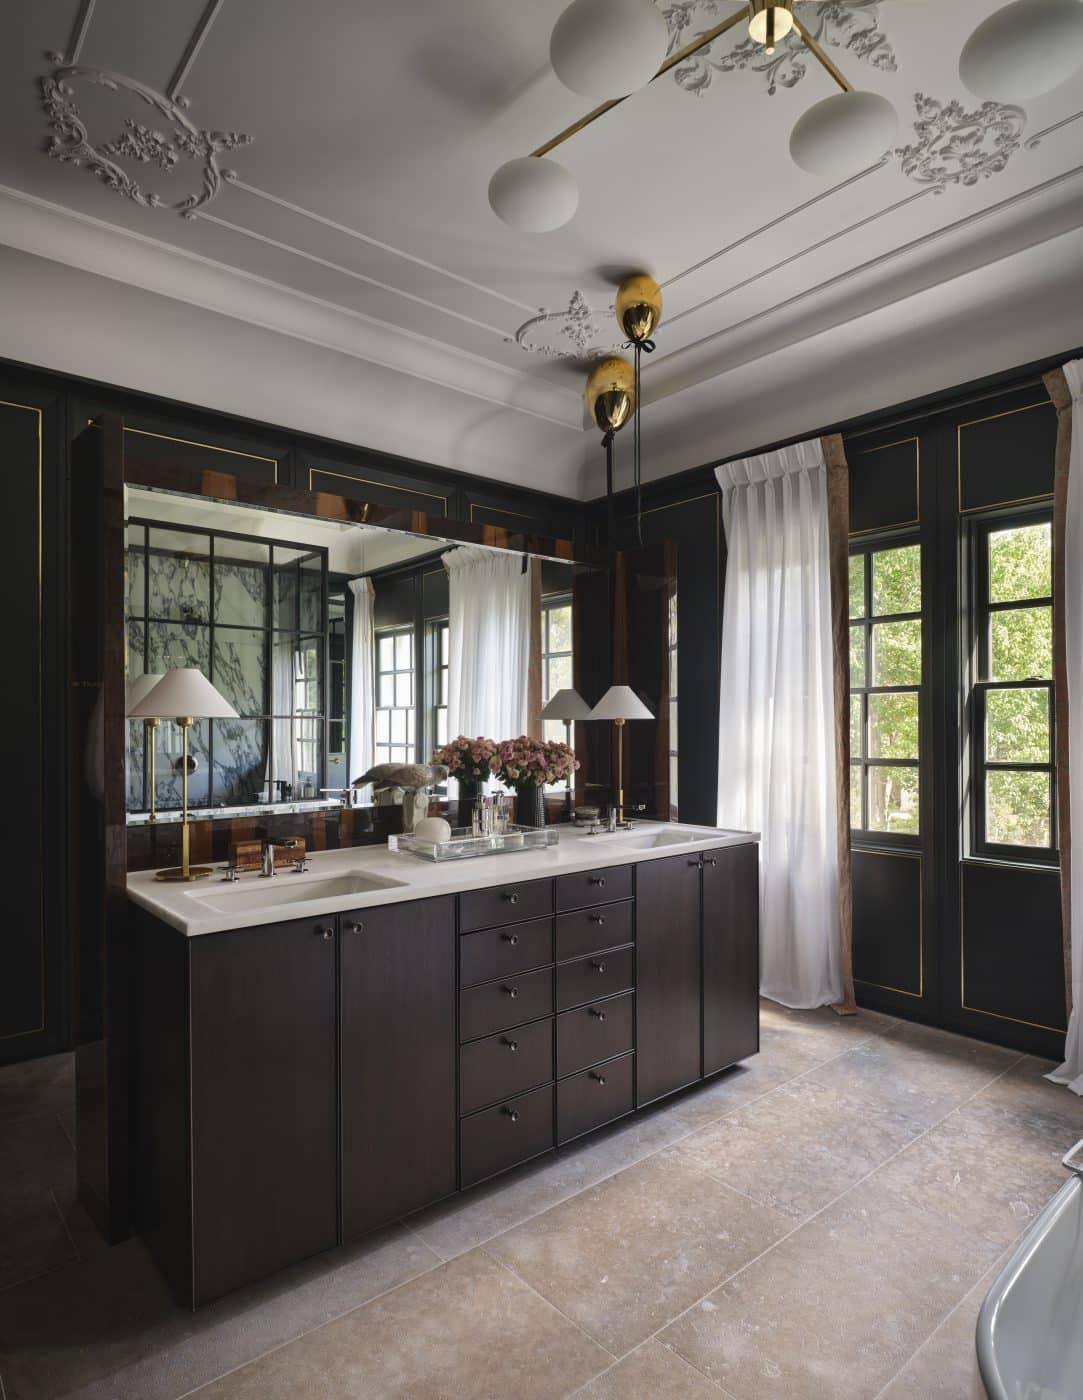 Bathroom designed by Brant McFarlain